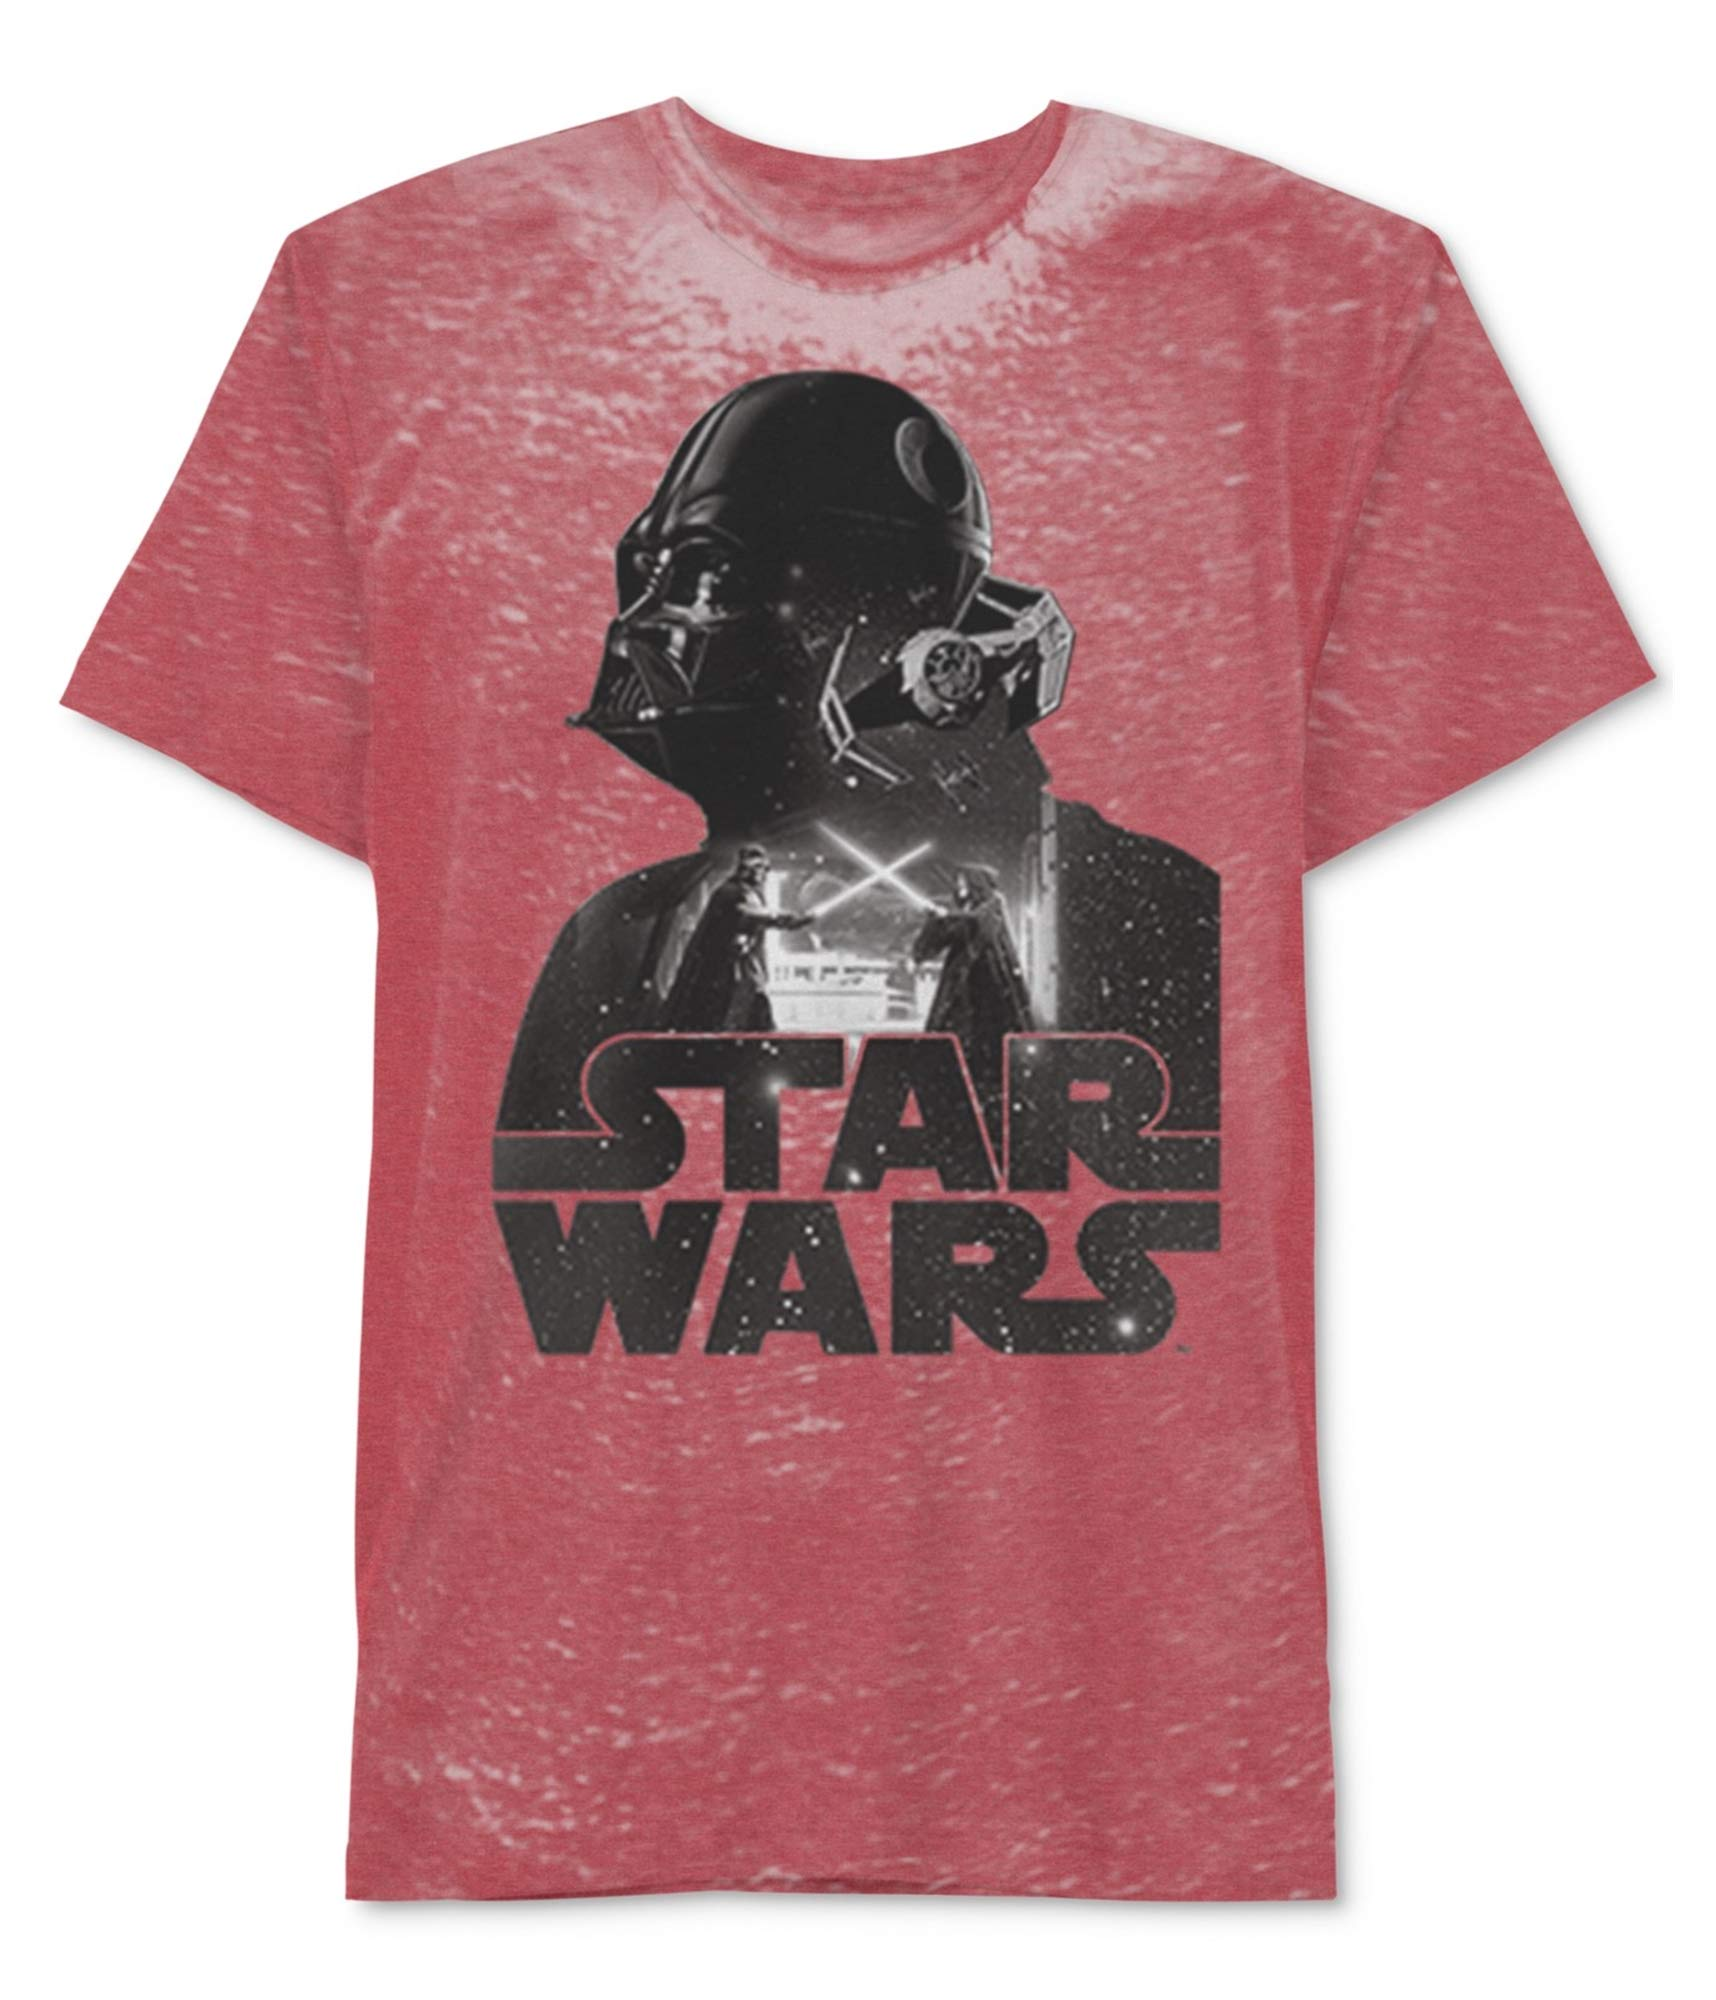 S Graphic T Shirt 8166